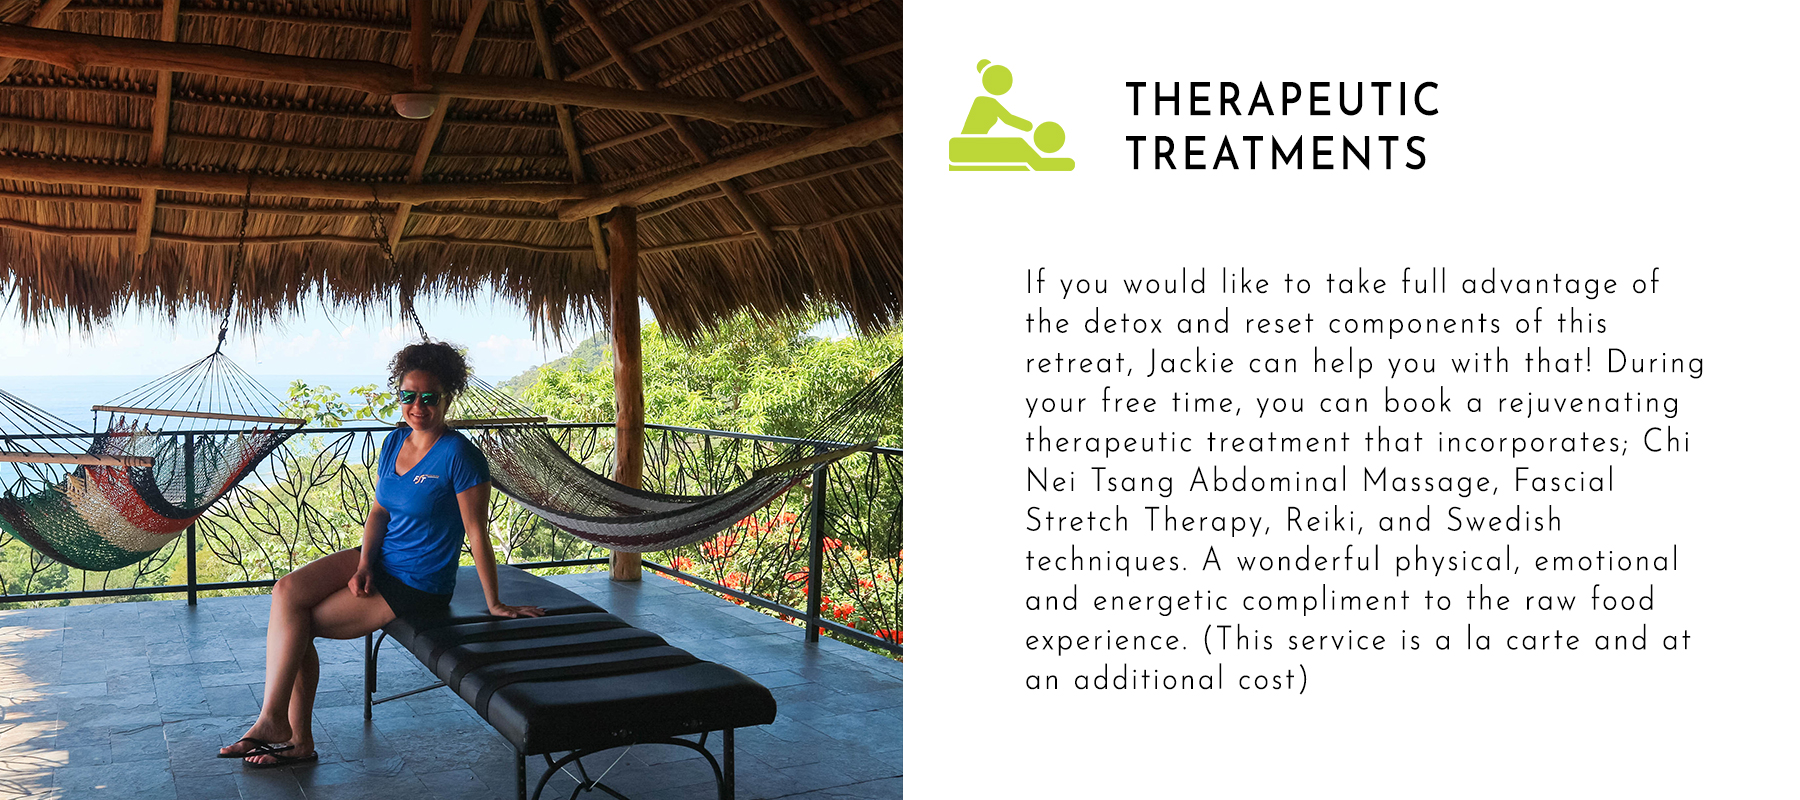 ACTIVITIES_Therapeutictreatments.jpg